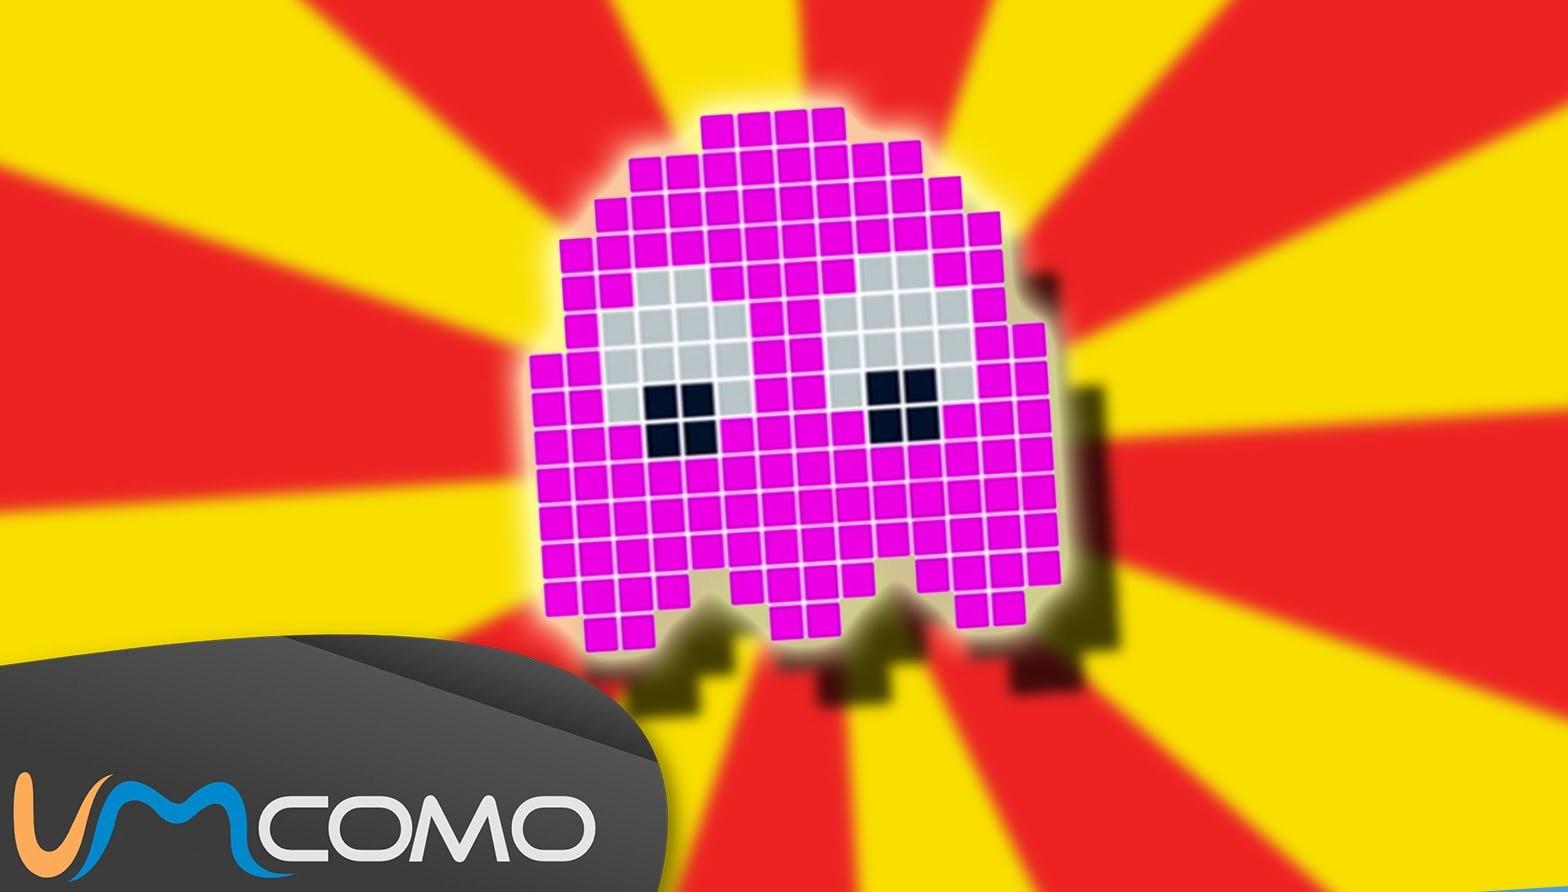 Fantasma Rosa do Pac-man - Hama Bead Tutorial Simples